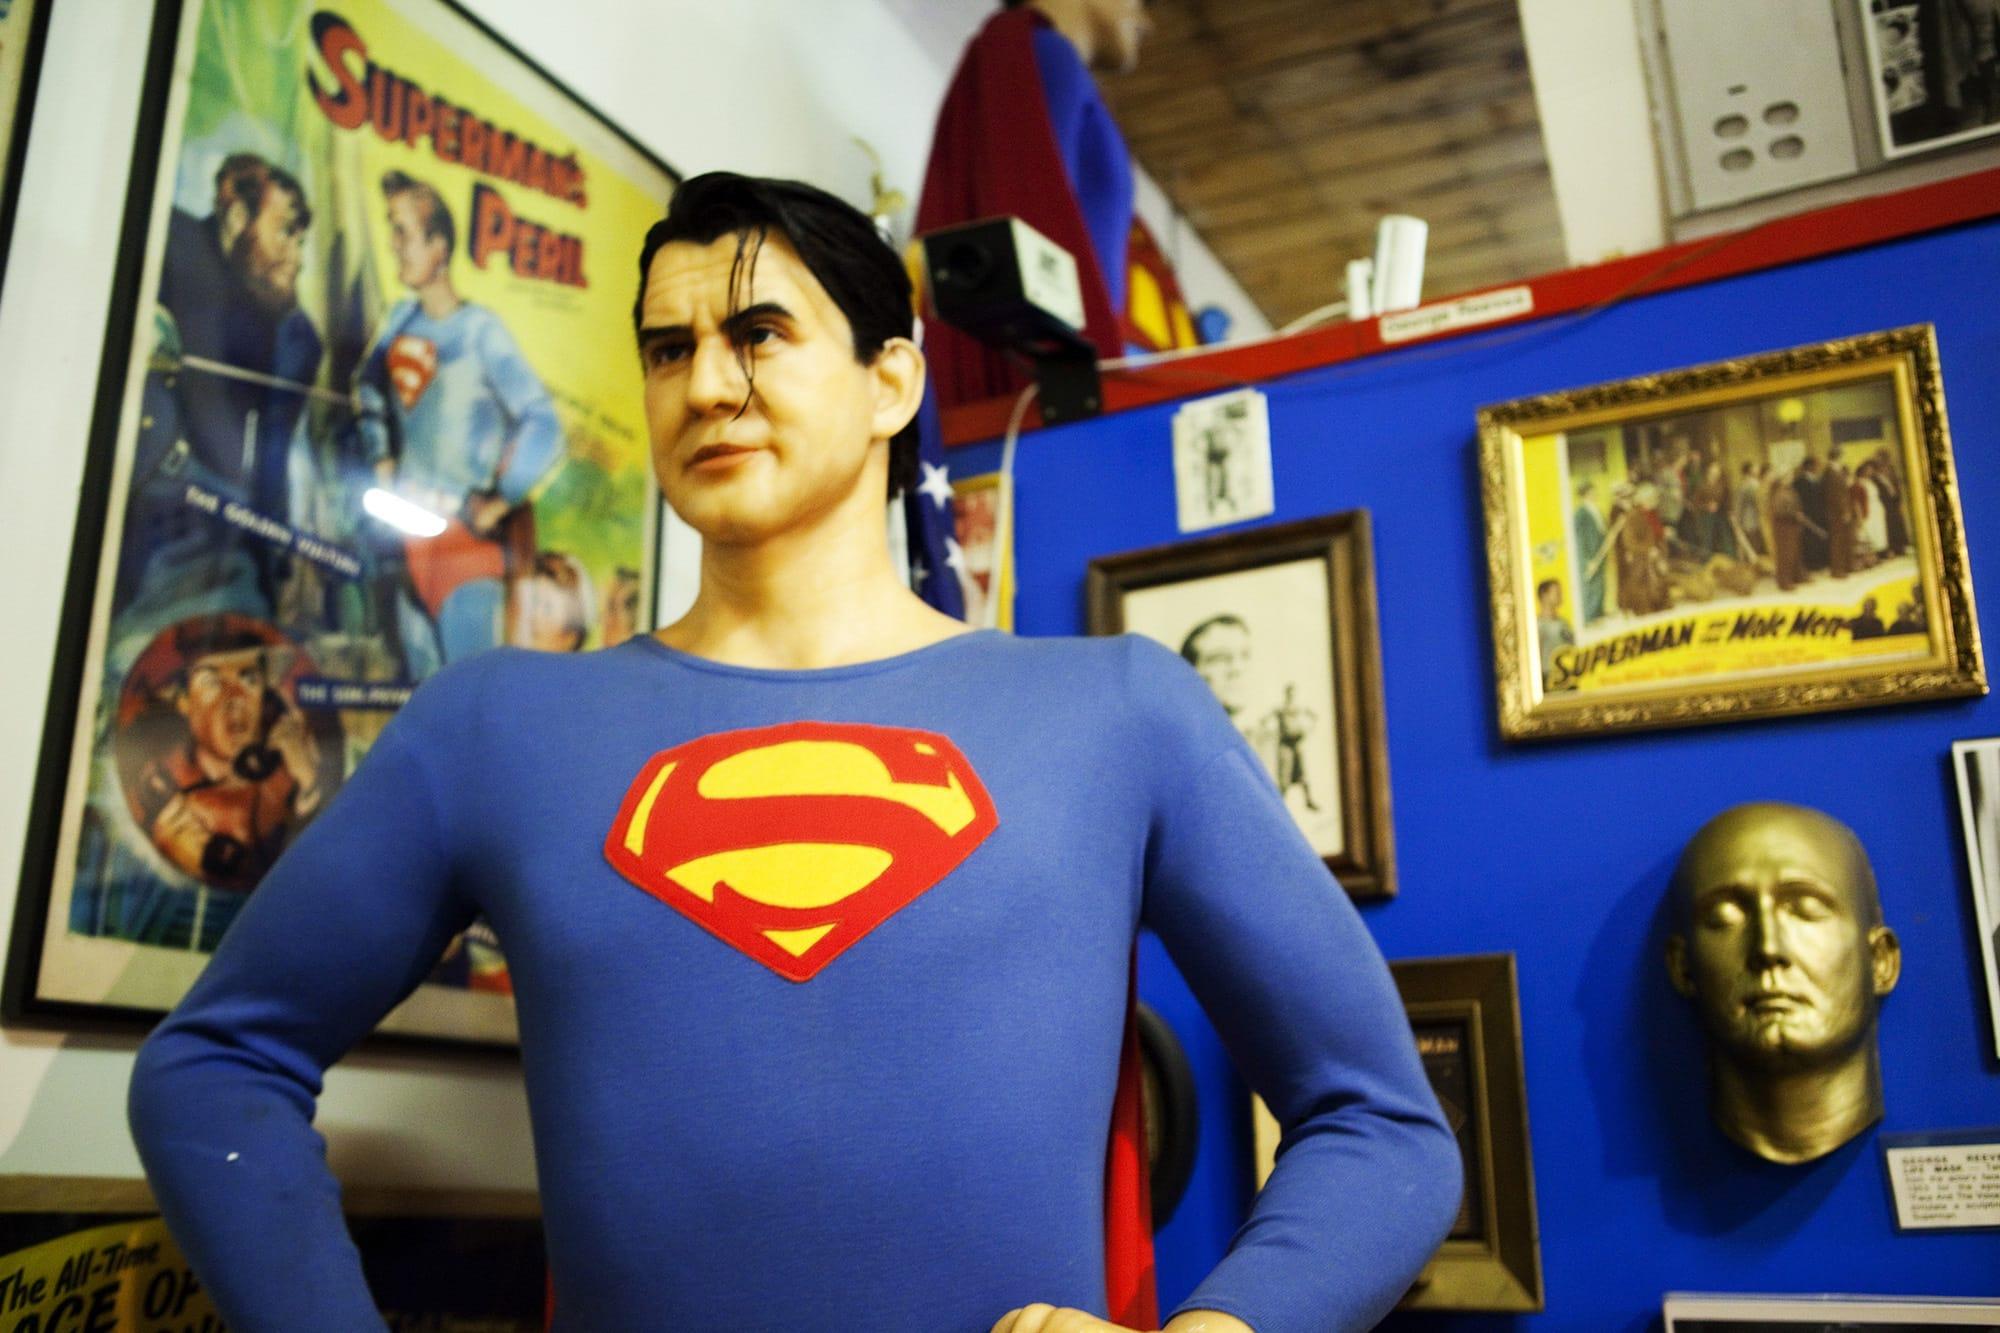 Superman Museum in Metropolis, Illinois